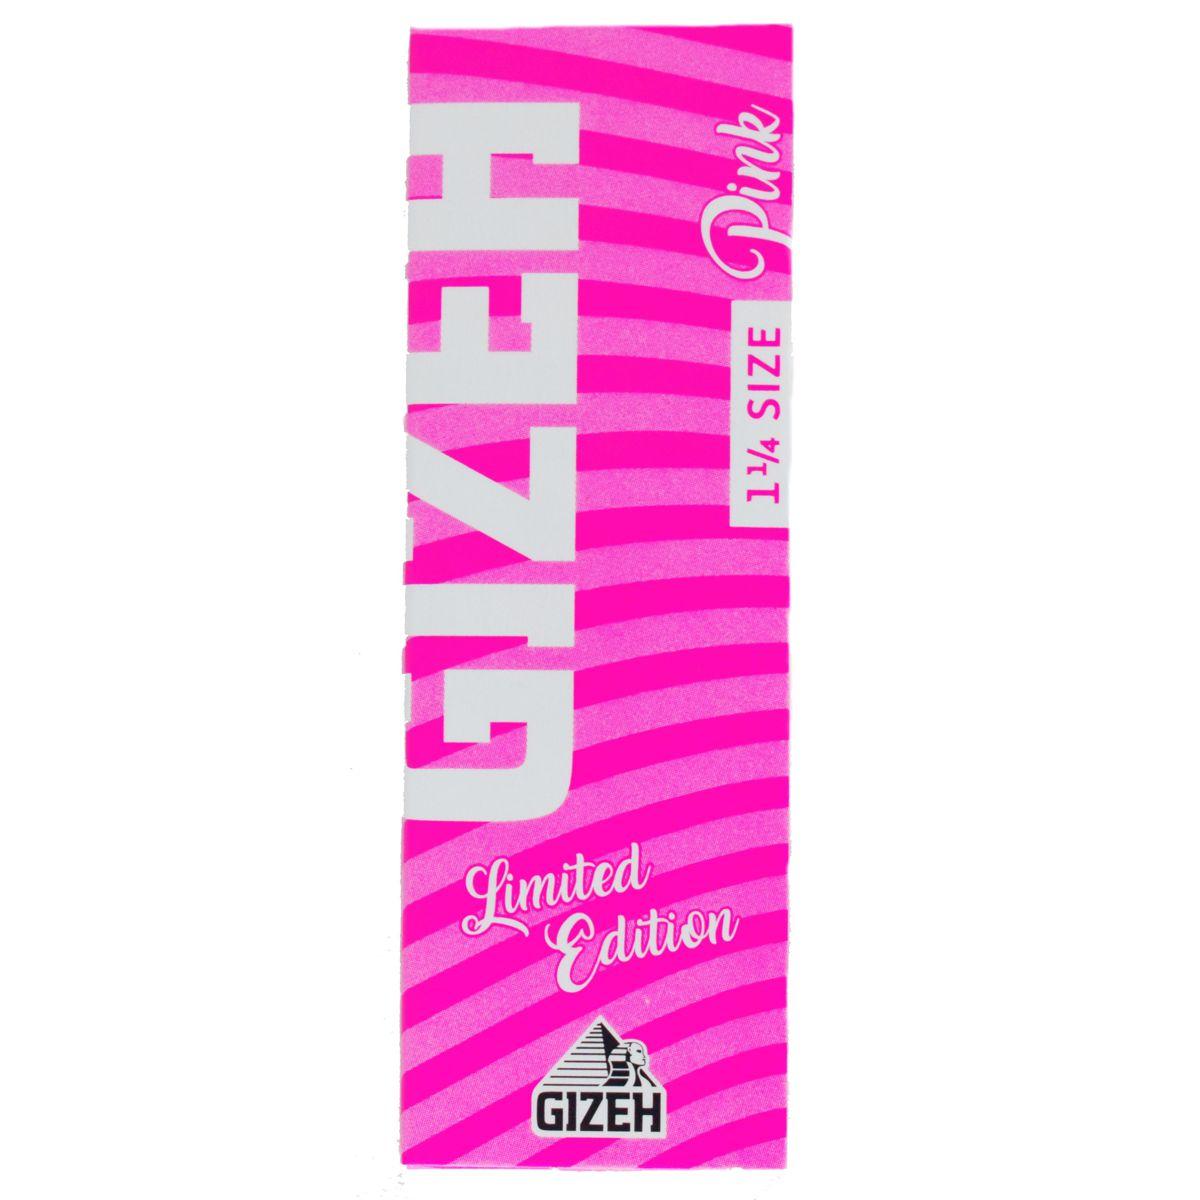 papel gizeh pink venta online